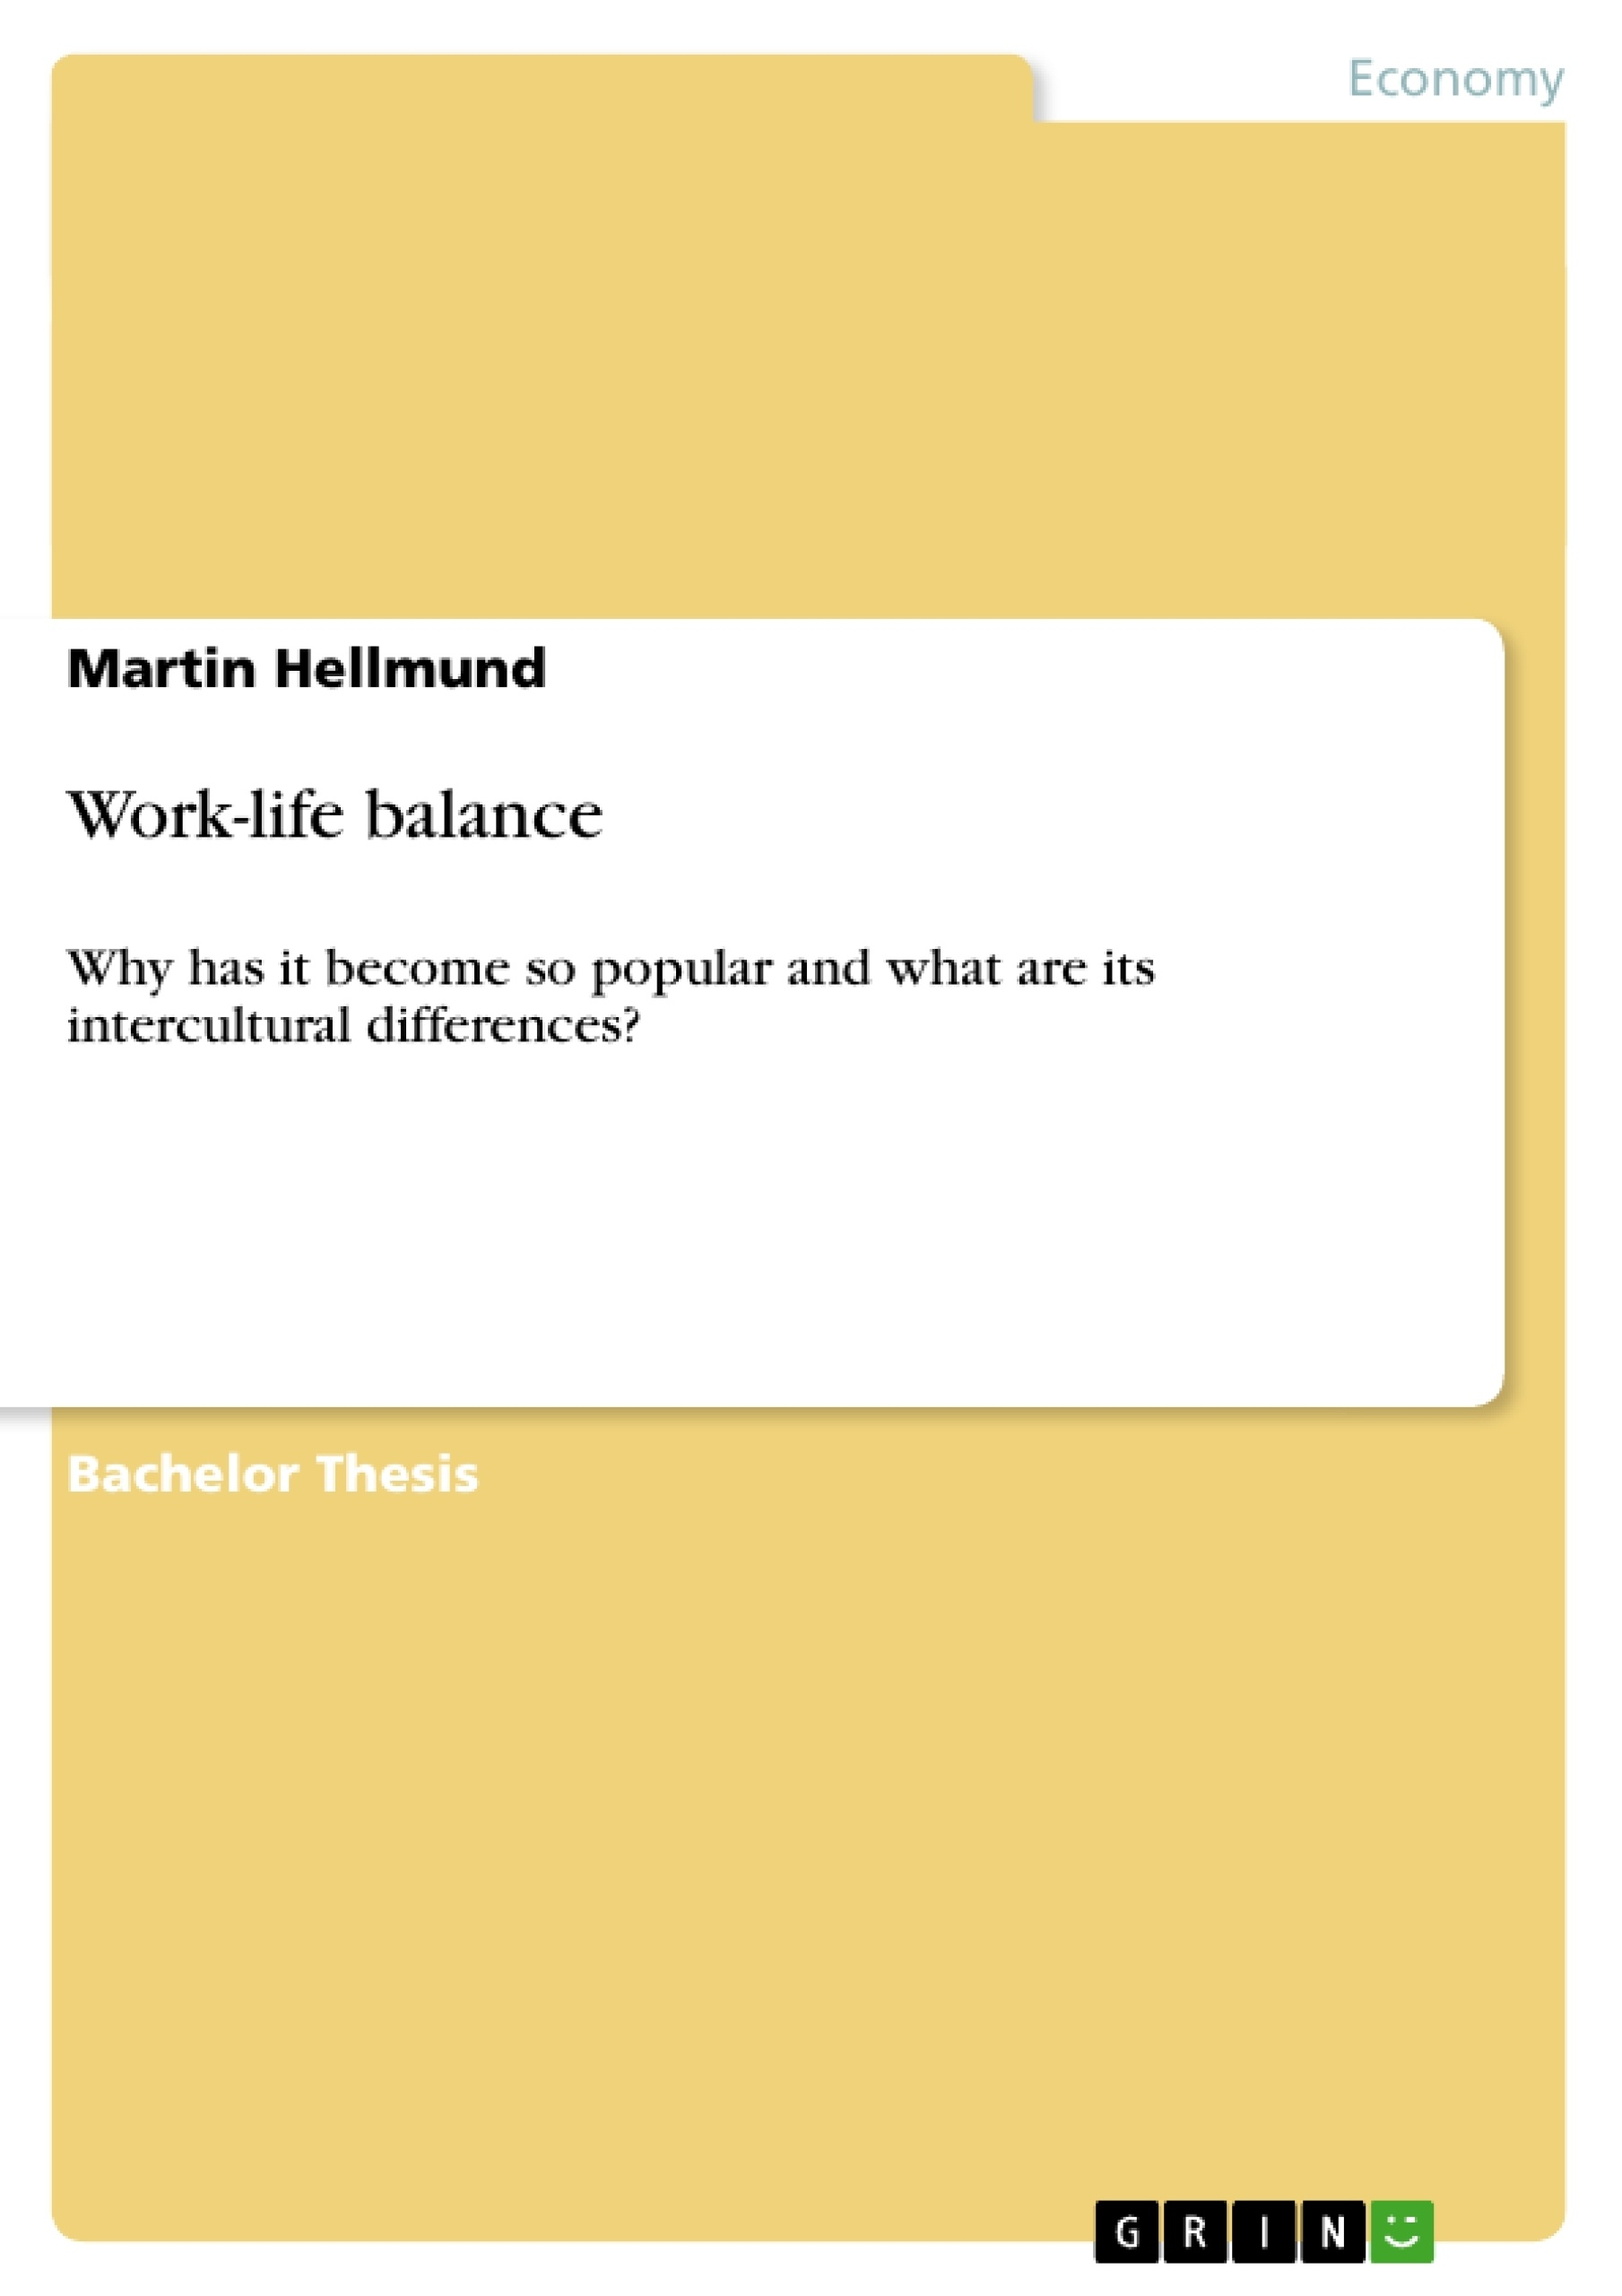 Title: Work-life balance